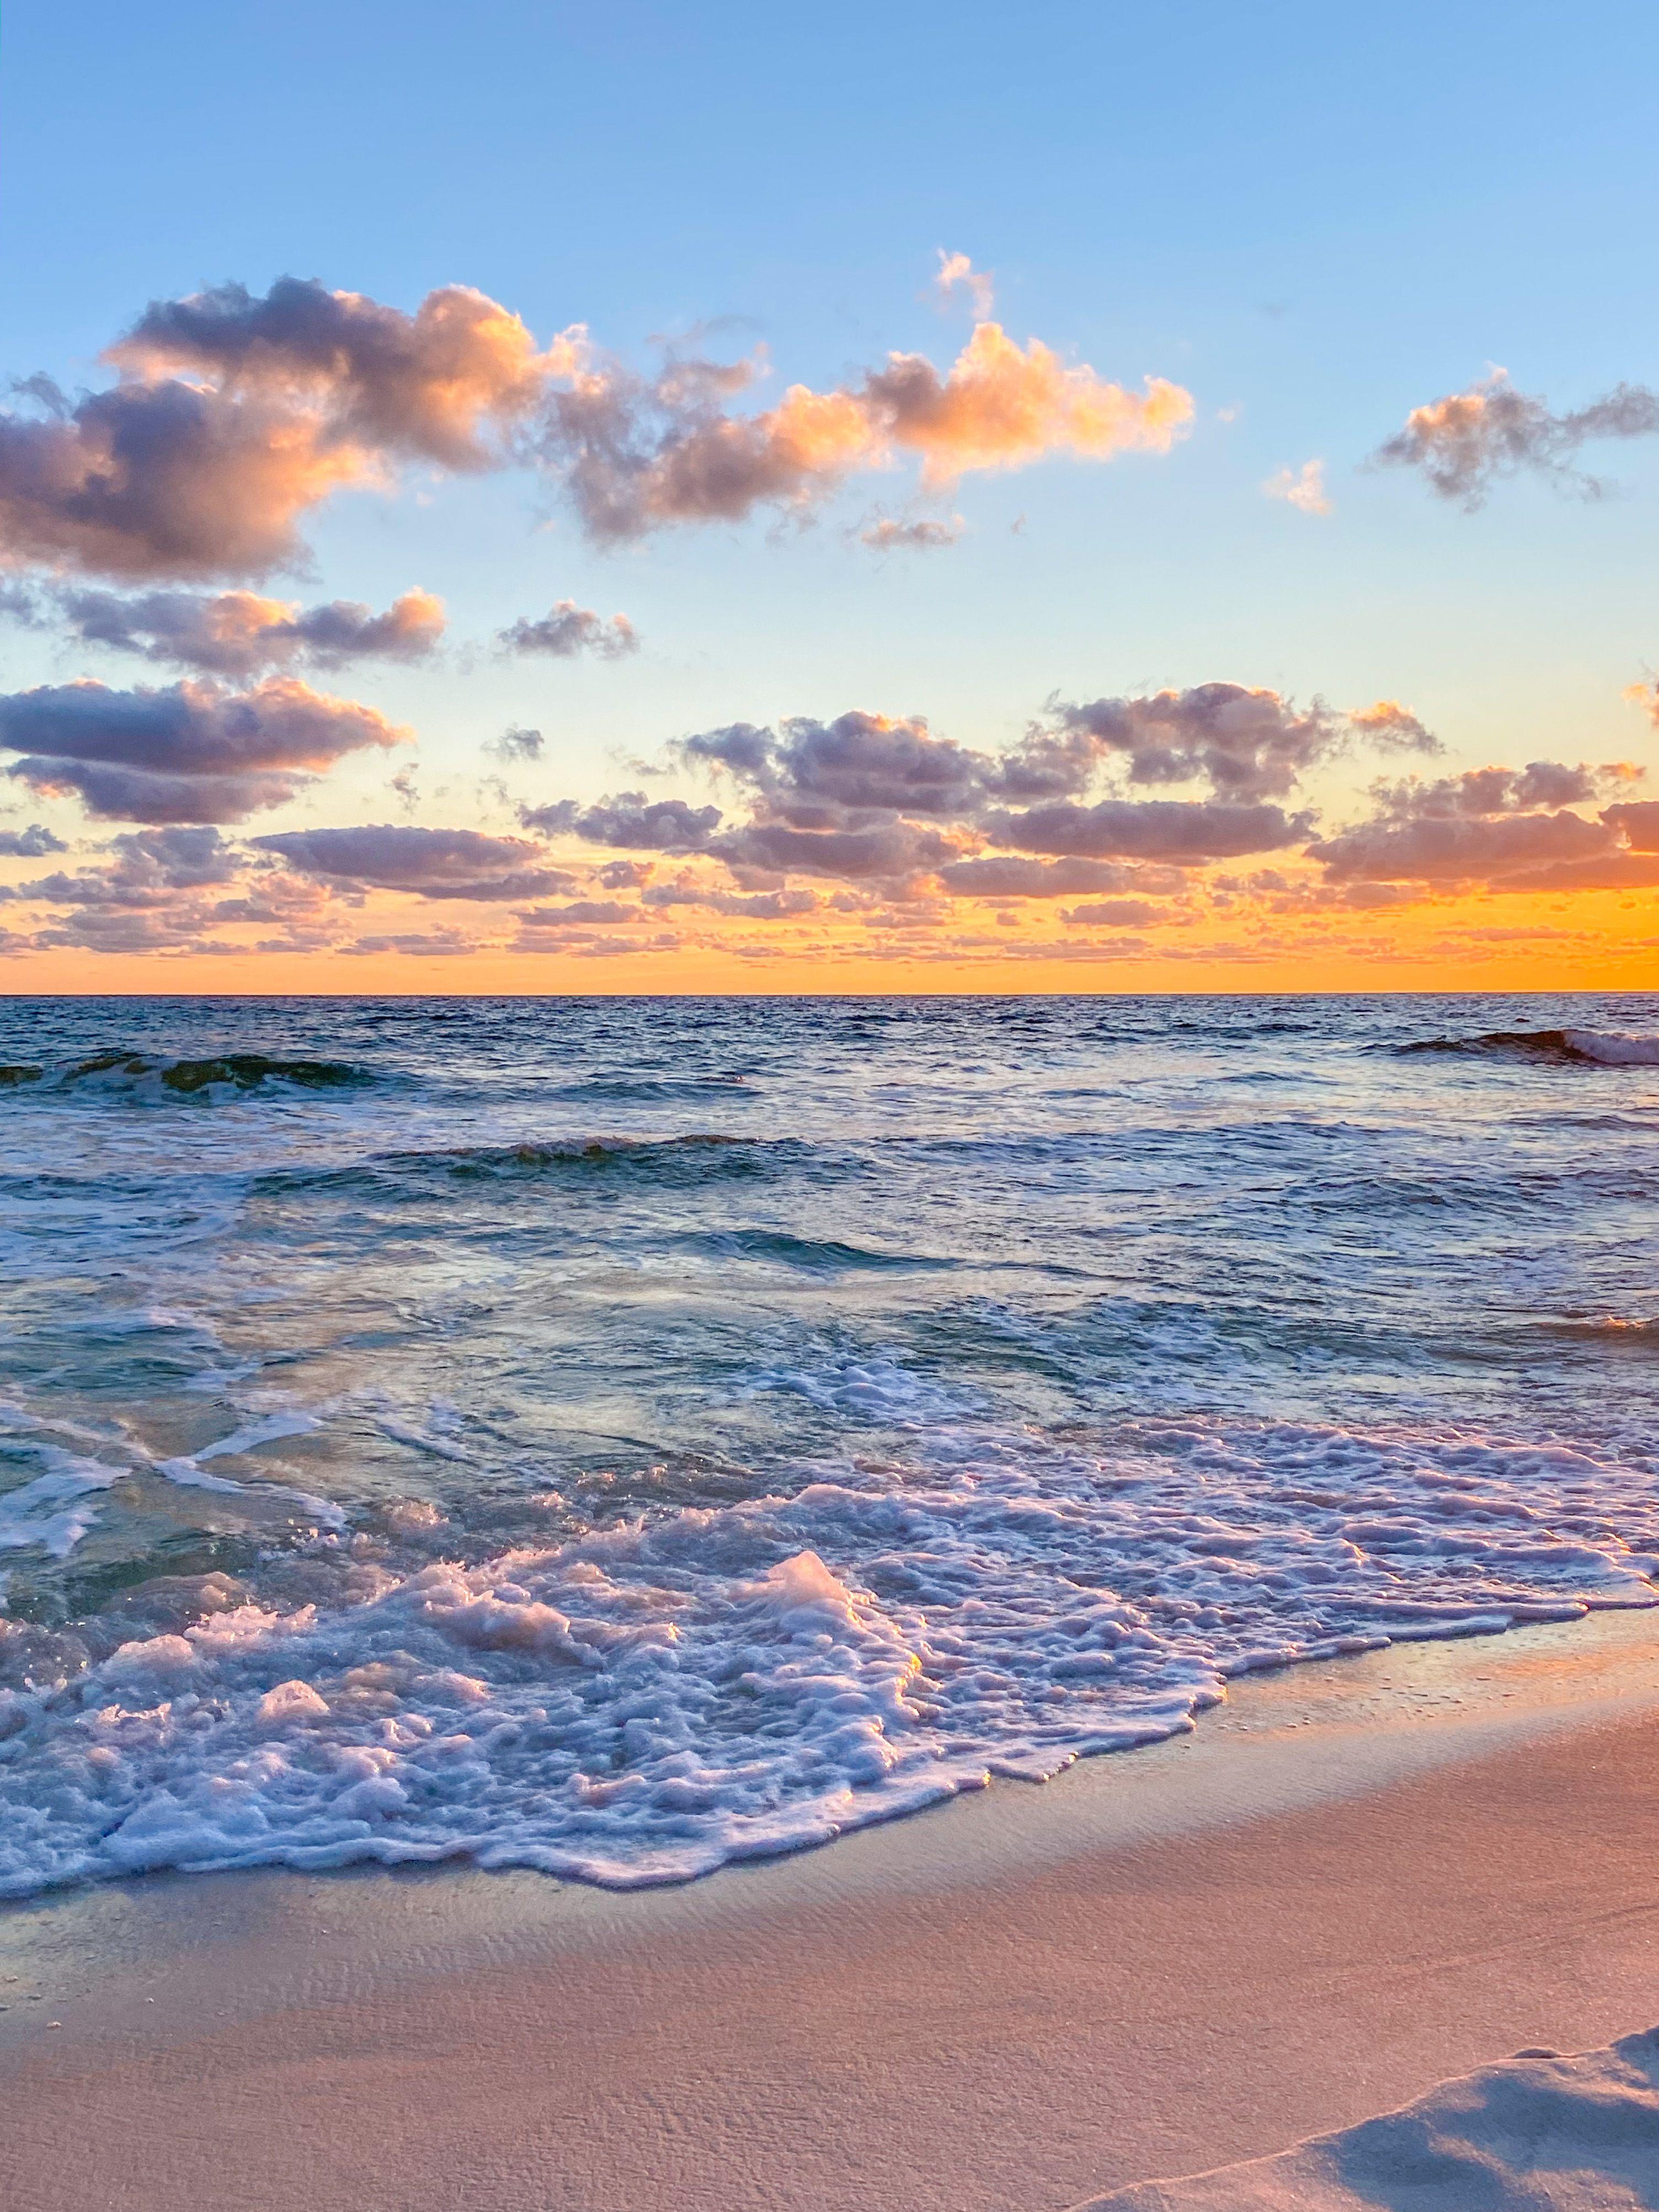 Sunset Okaloosa Island Fl In 2020 Okaloosa Island Instagram Sunset